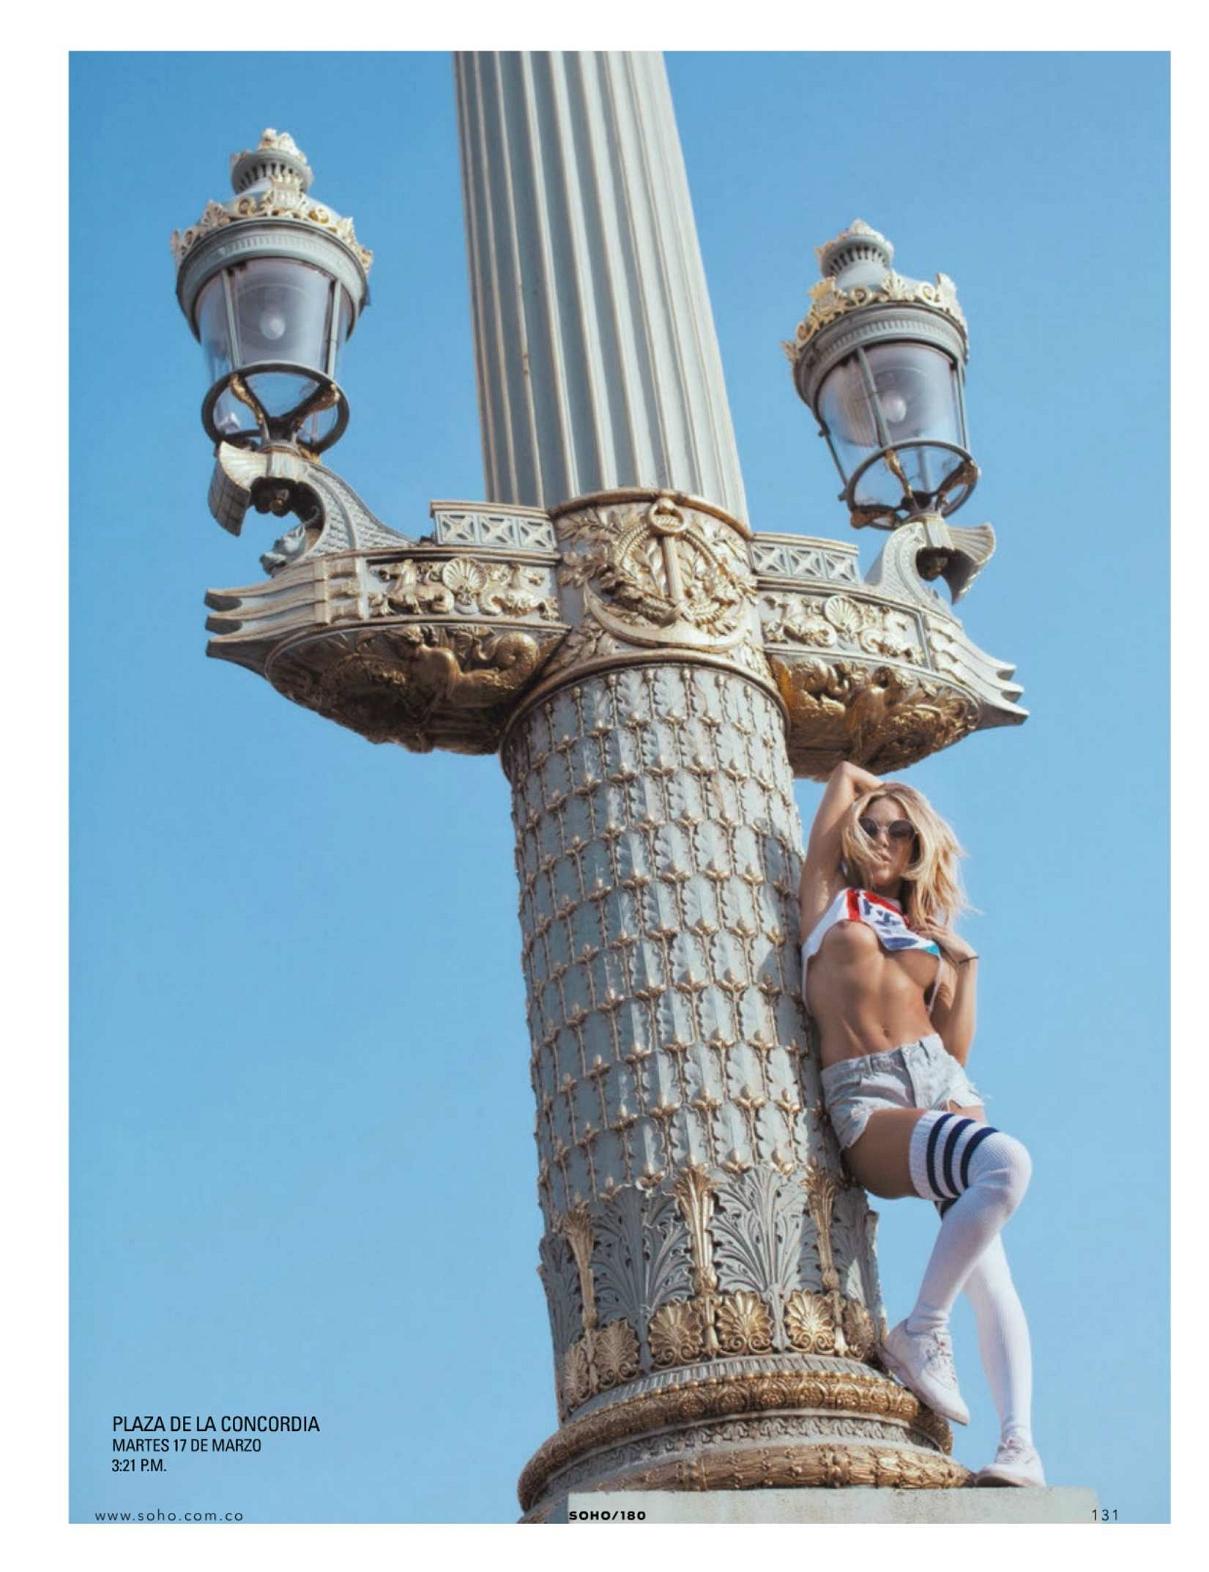 Natalia Paris Topless (13 Photos)